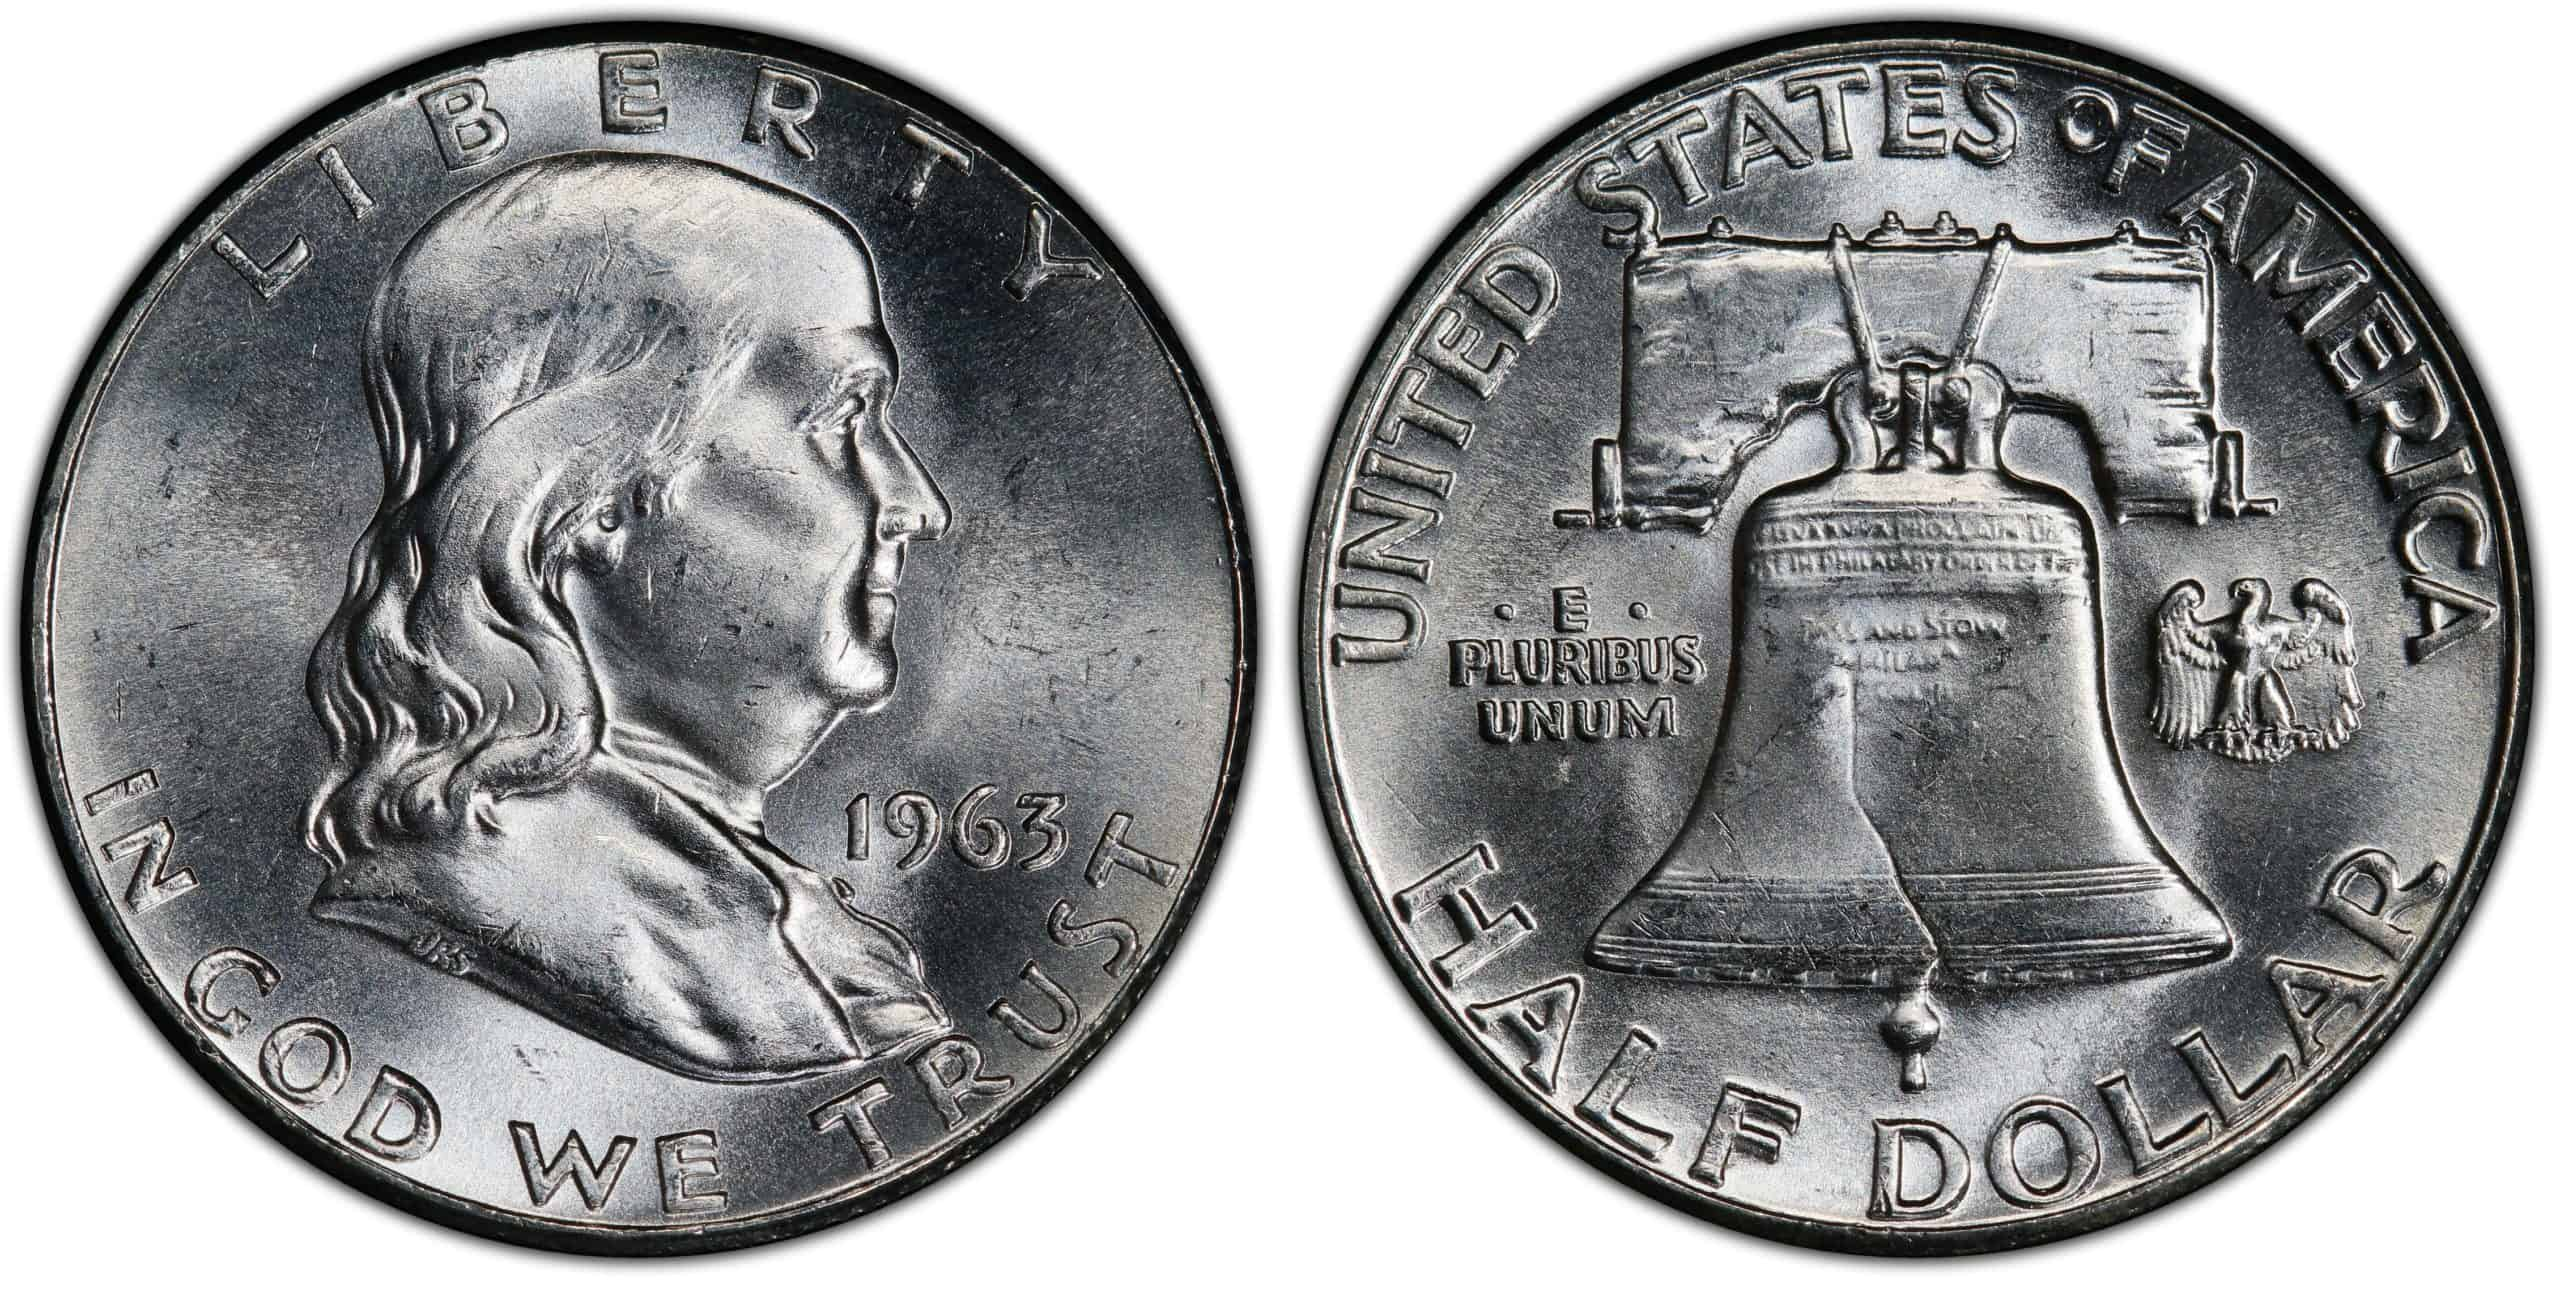 History of the 1963 Franklin Half Dollar